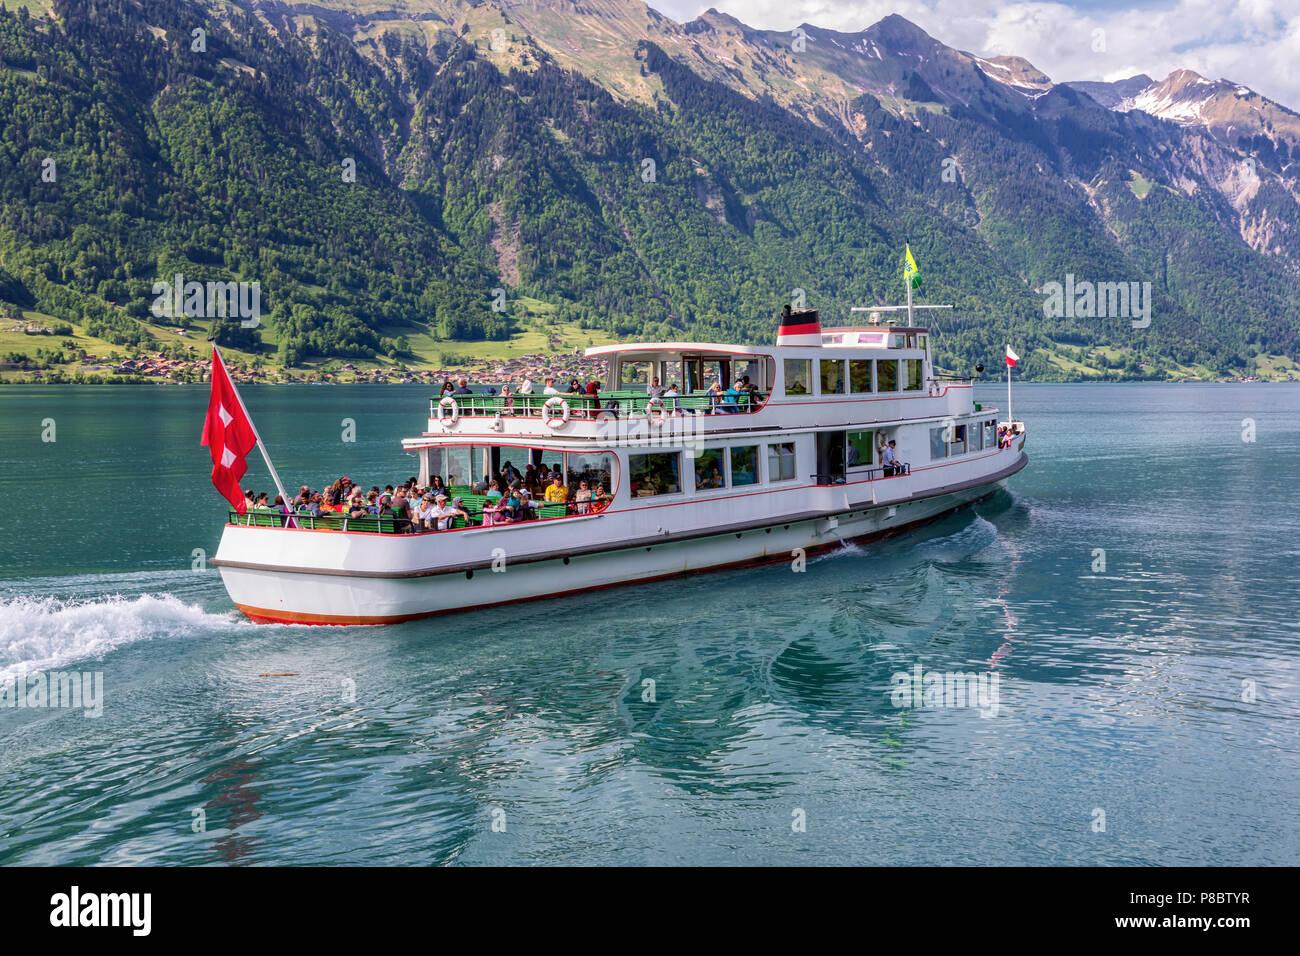 Cruising steamer boat on Lake Brienz, Bernese Oberland, Switzerland - Stock Image